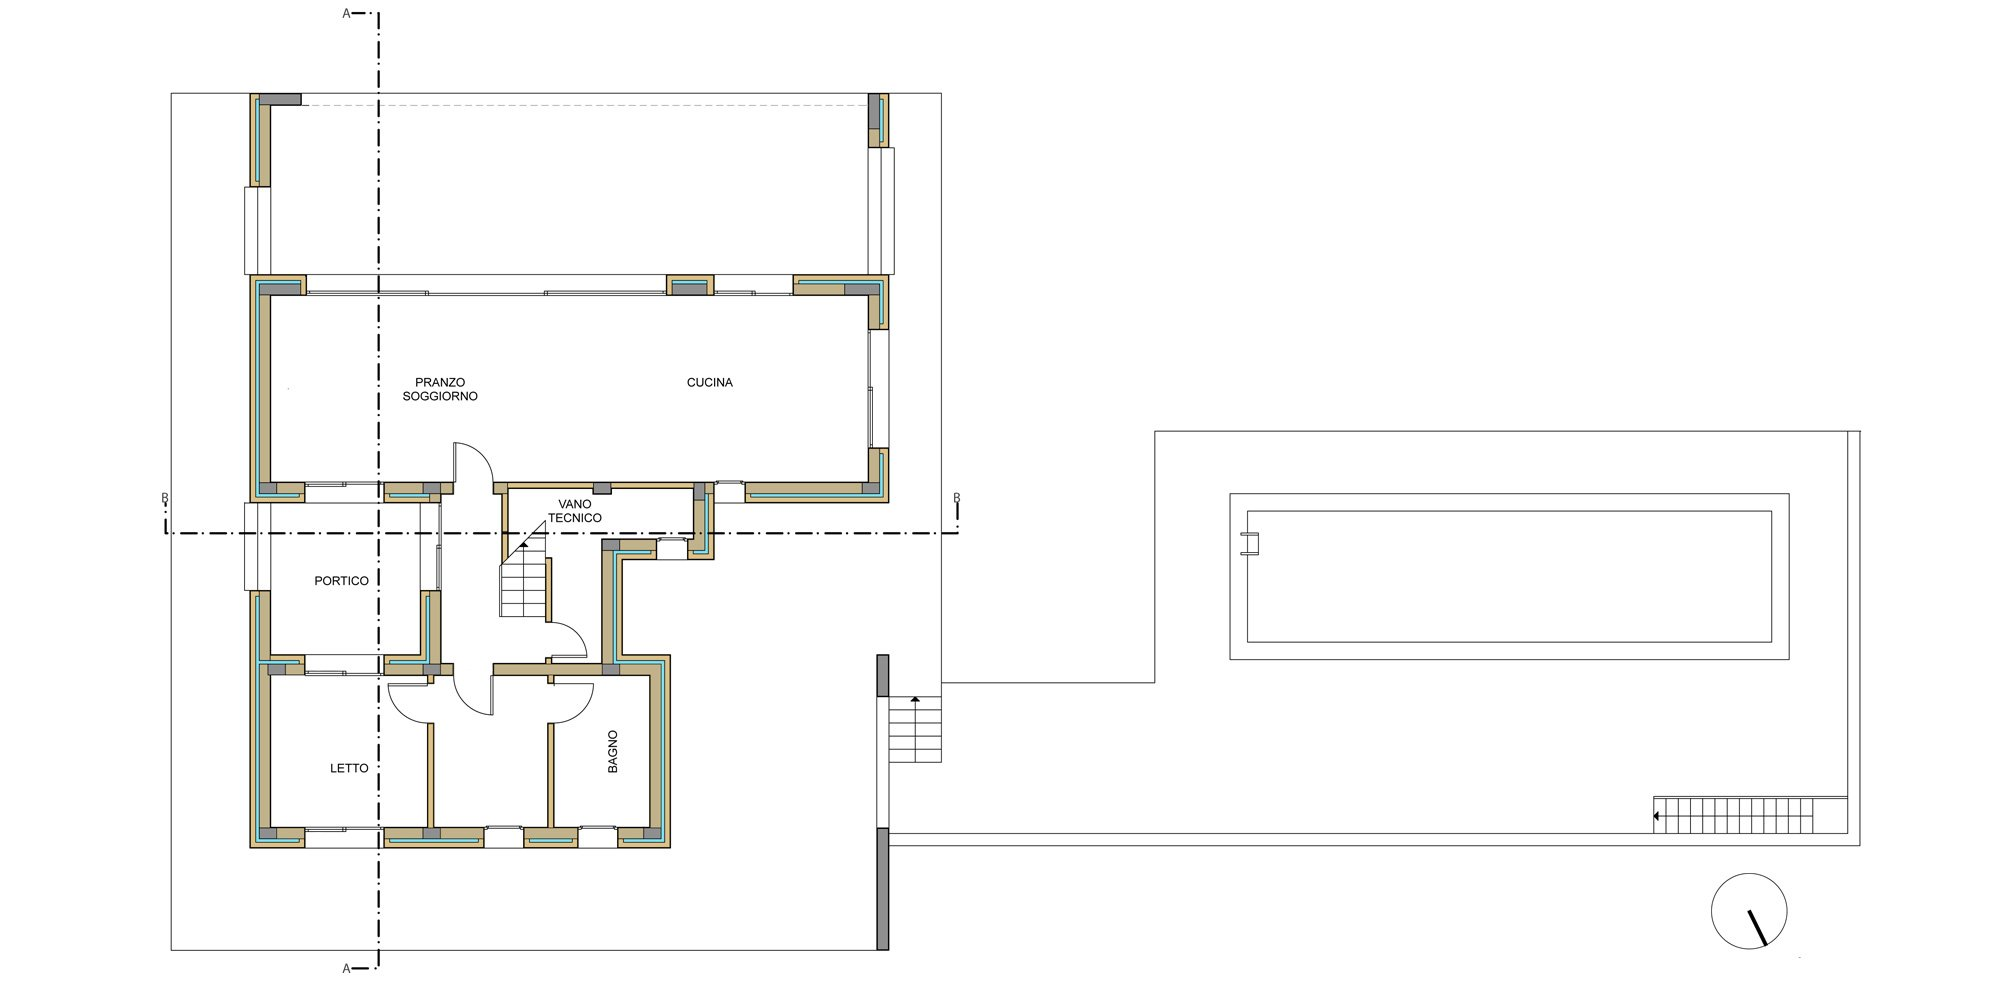 GROUND FLOOR PLAN © Francesco Pascali Architetto